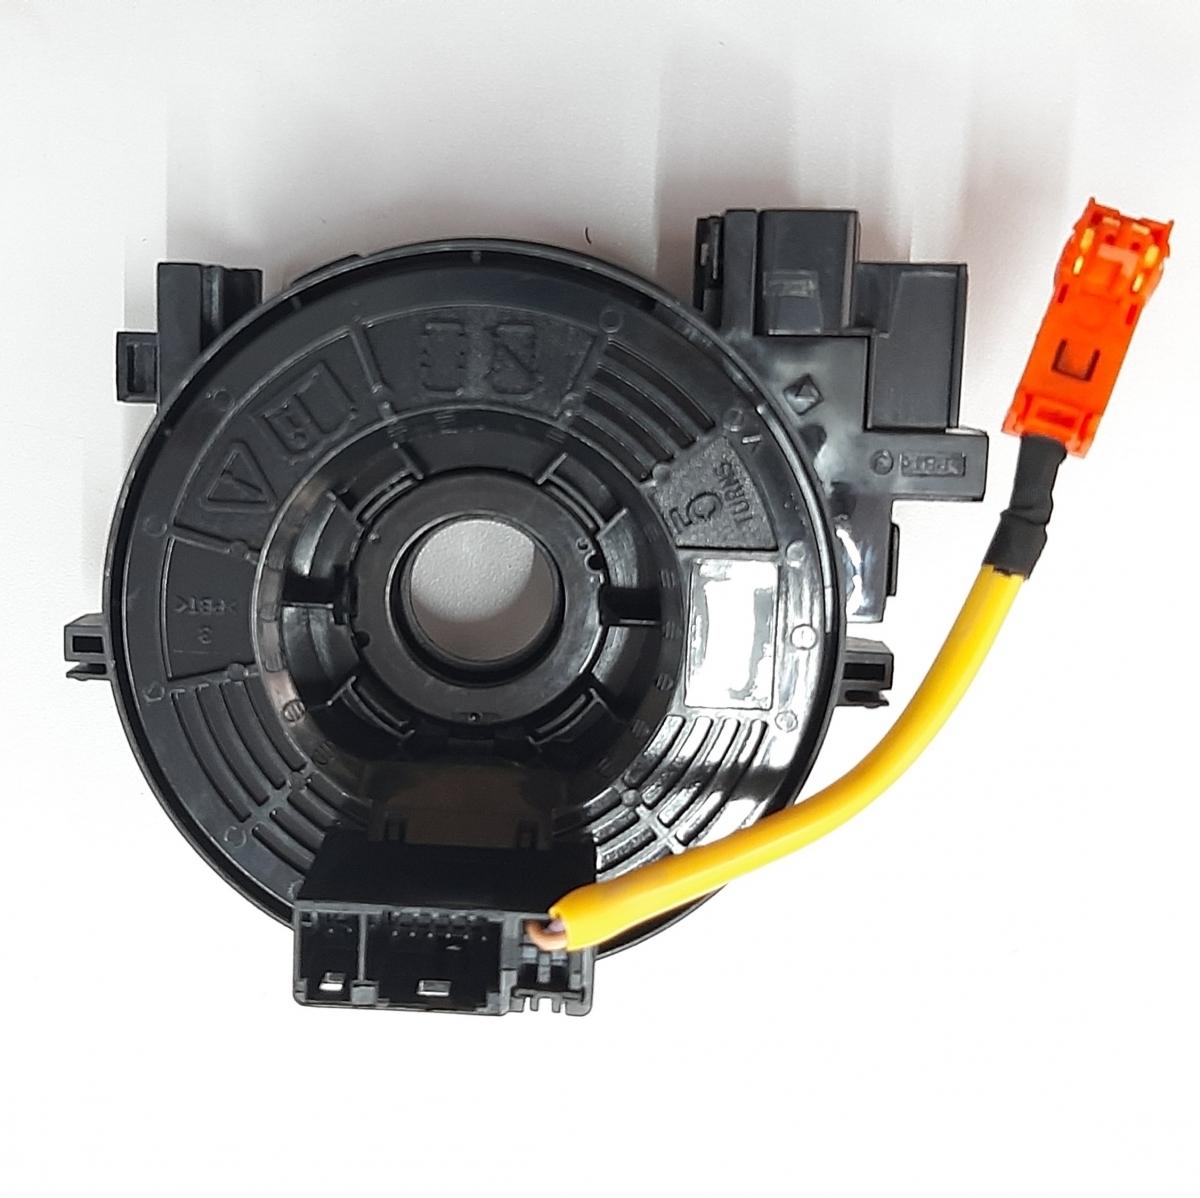 Fita Hard Disk Corolla 15/18 _ RAV4 13 - Foto 1